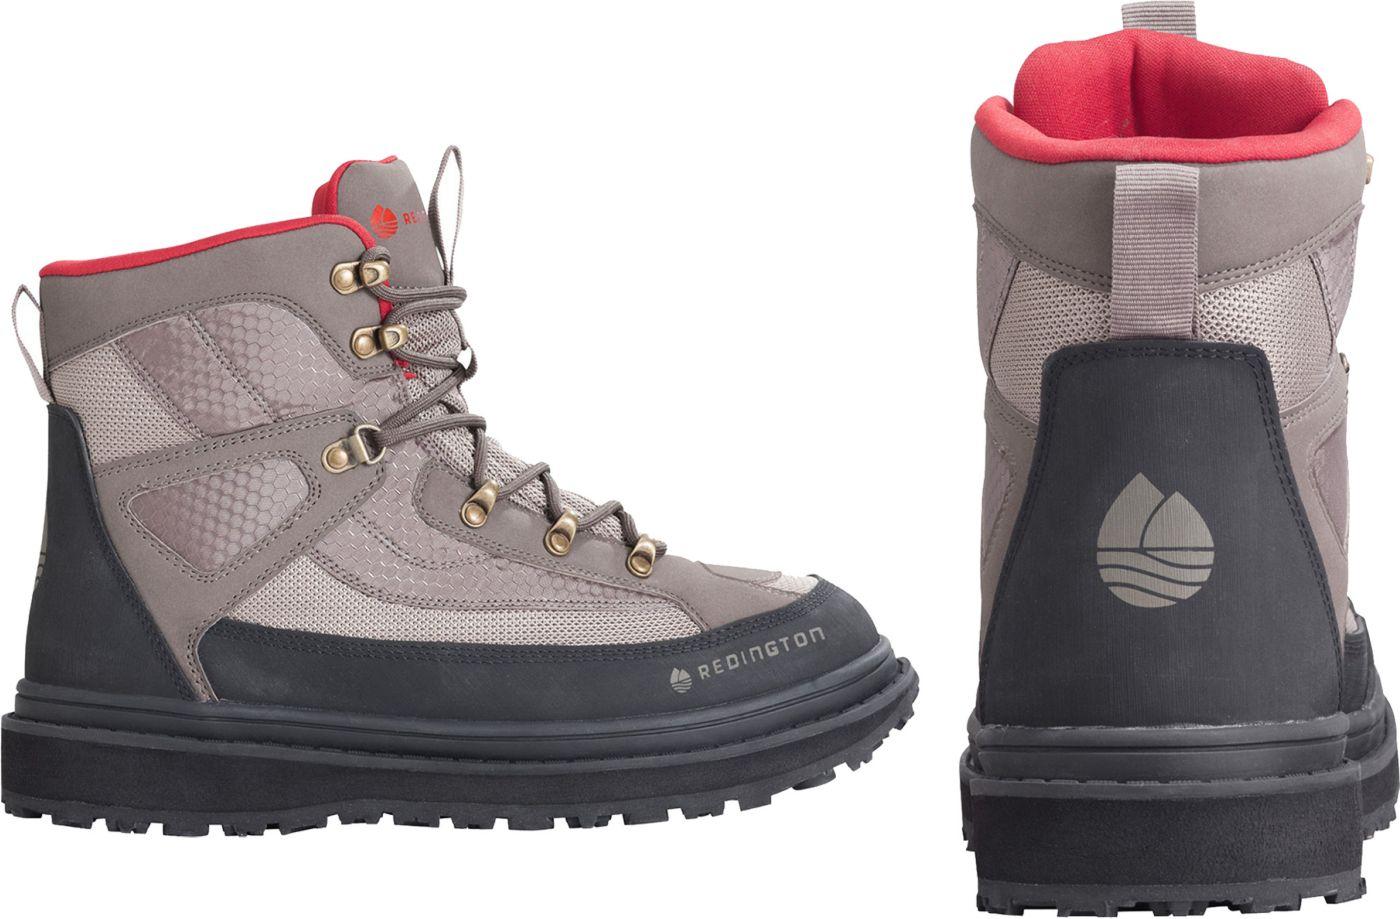 Redington Skagit River Sticky Rubber Wading Boots